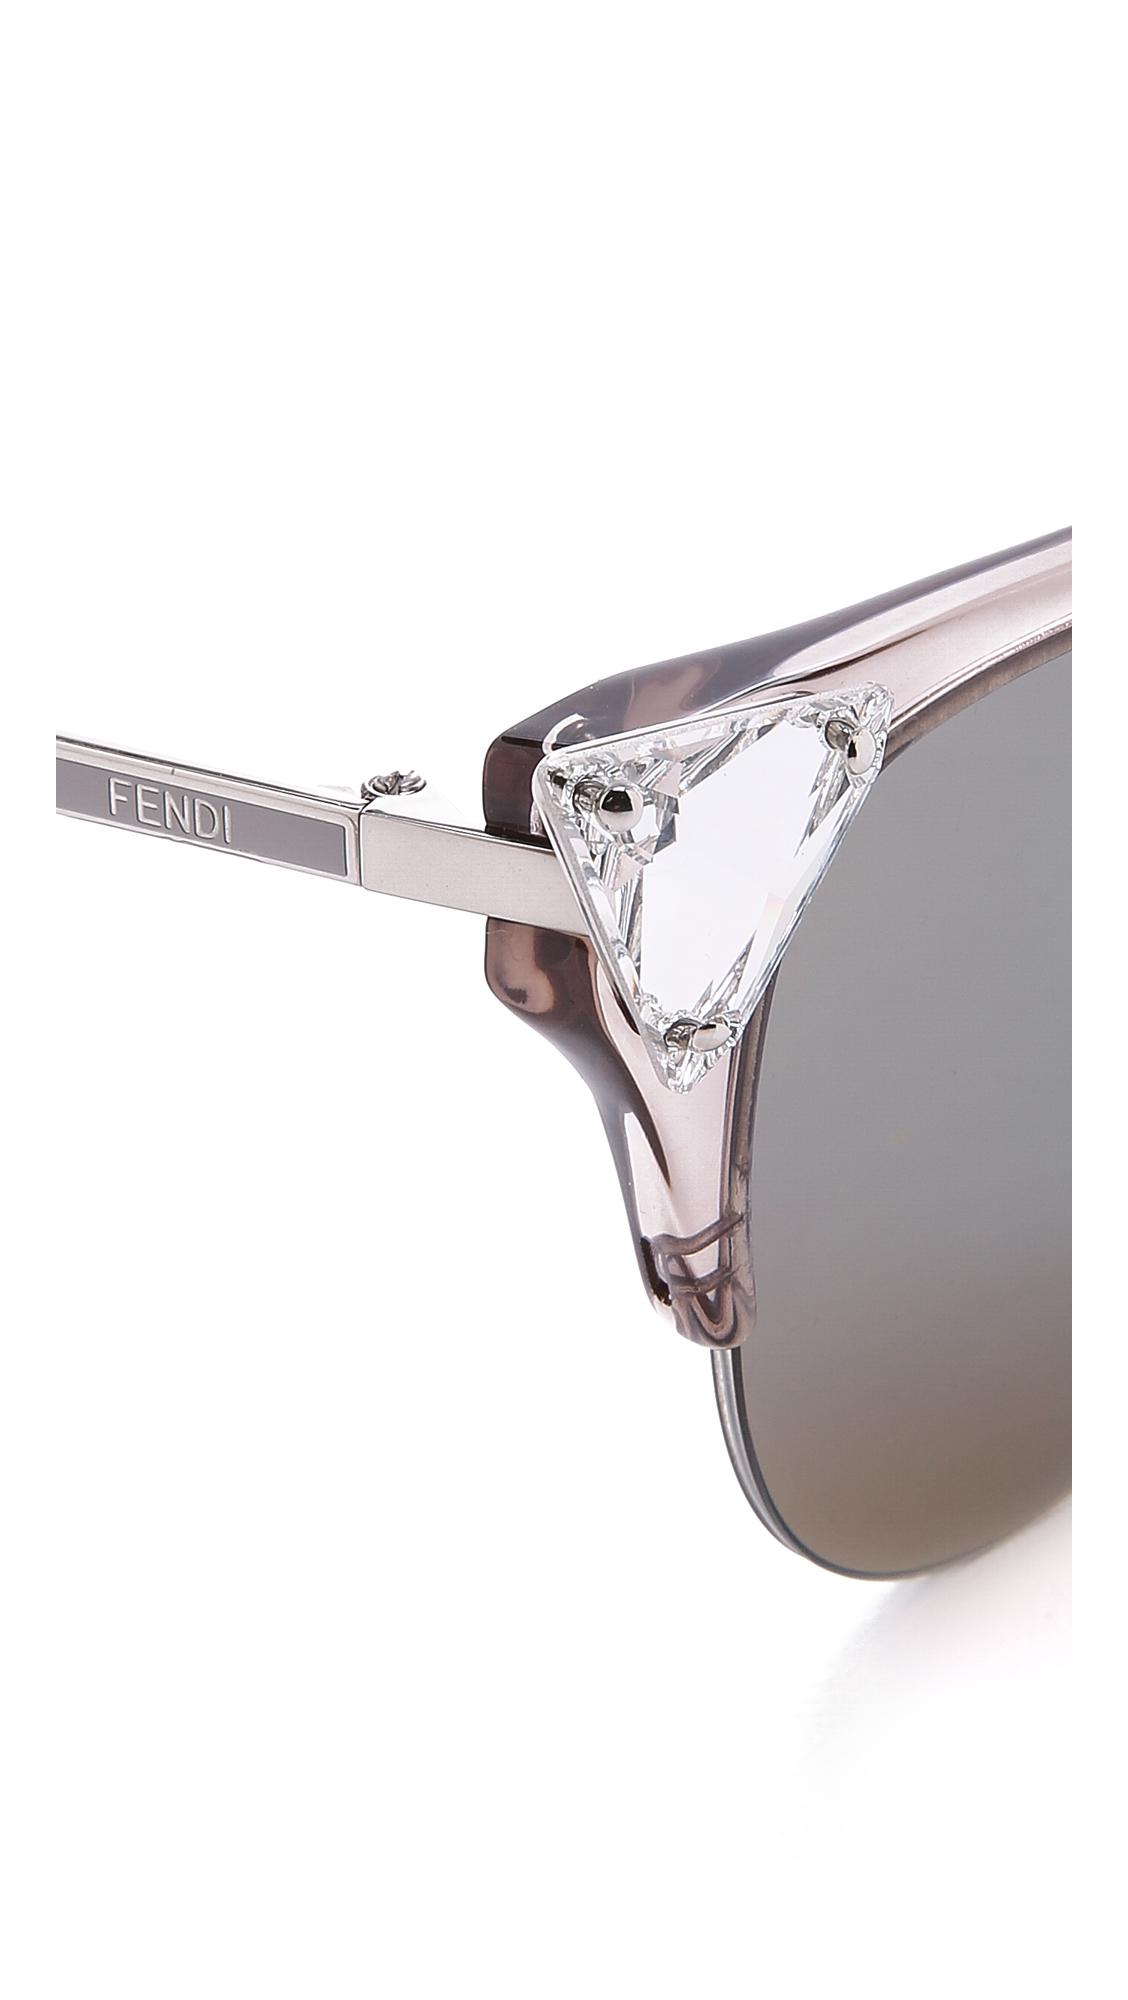 c436cdad387e Fendi Crystal Corner Sunglasses - Transparent Blue burgundy in Gray ...